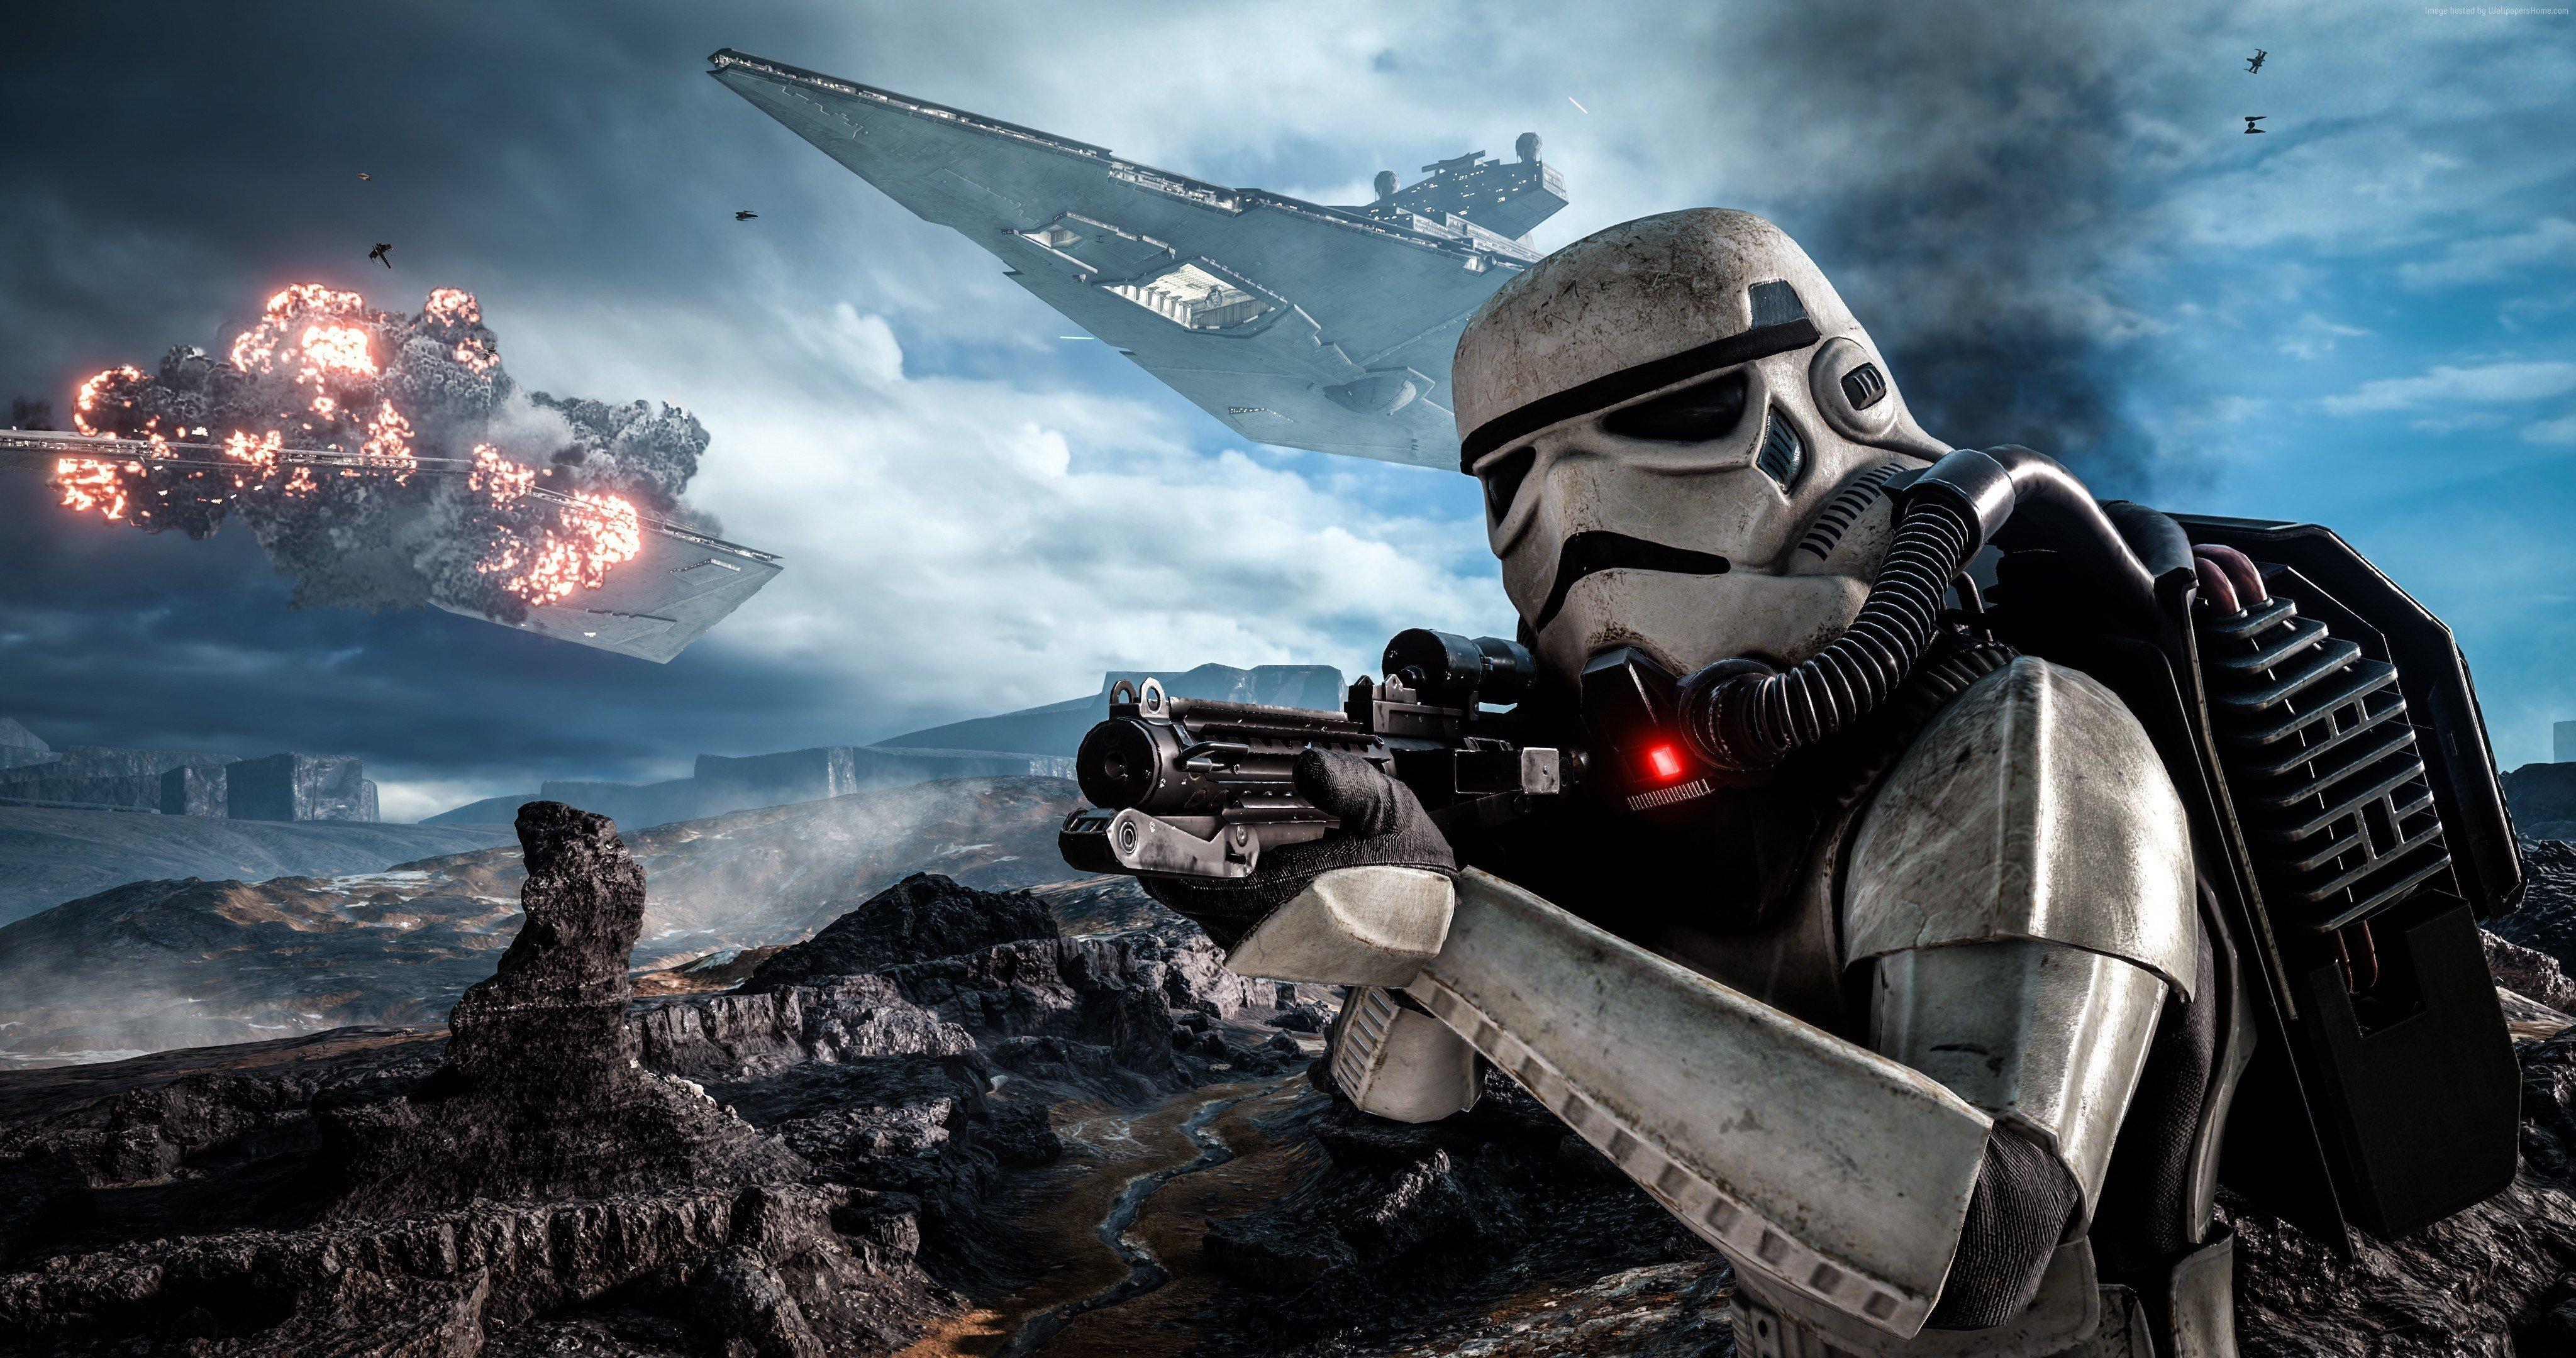 star-wars-battlefront-4096x2160-dice-best-games-game-shooter-star-8448.jpg